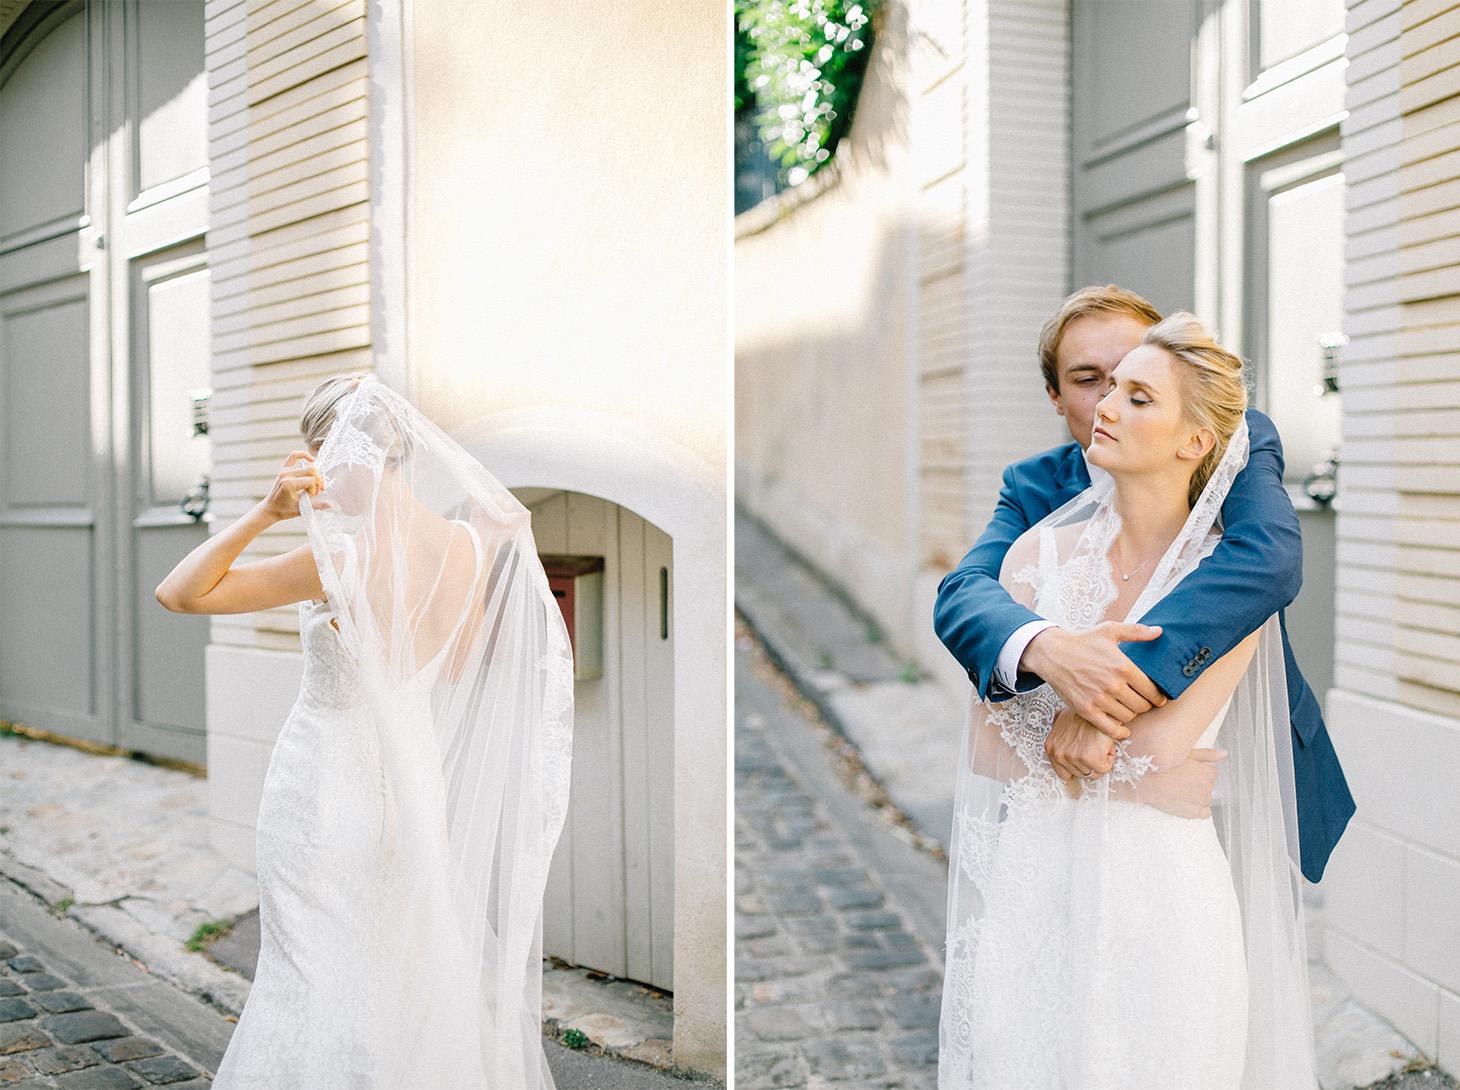 photographe-mariage-paris-montfort-l-amaury-051